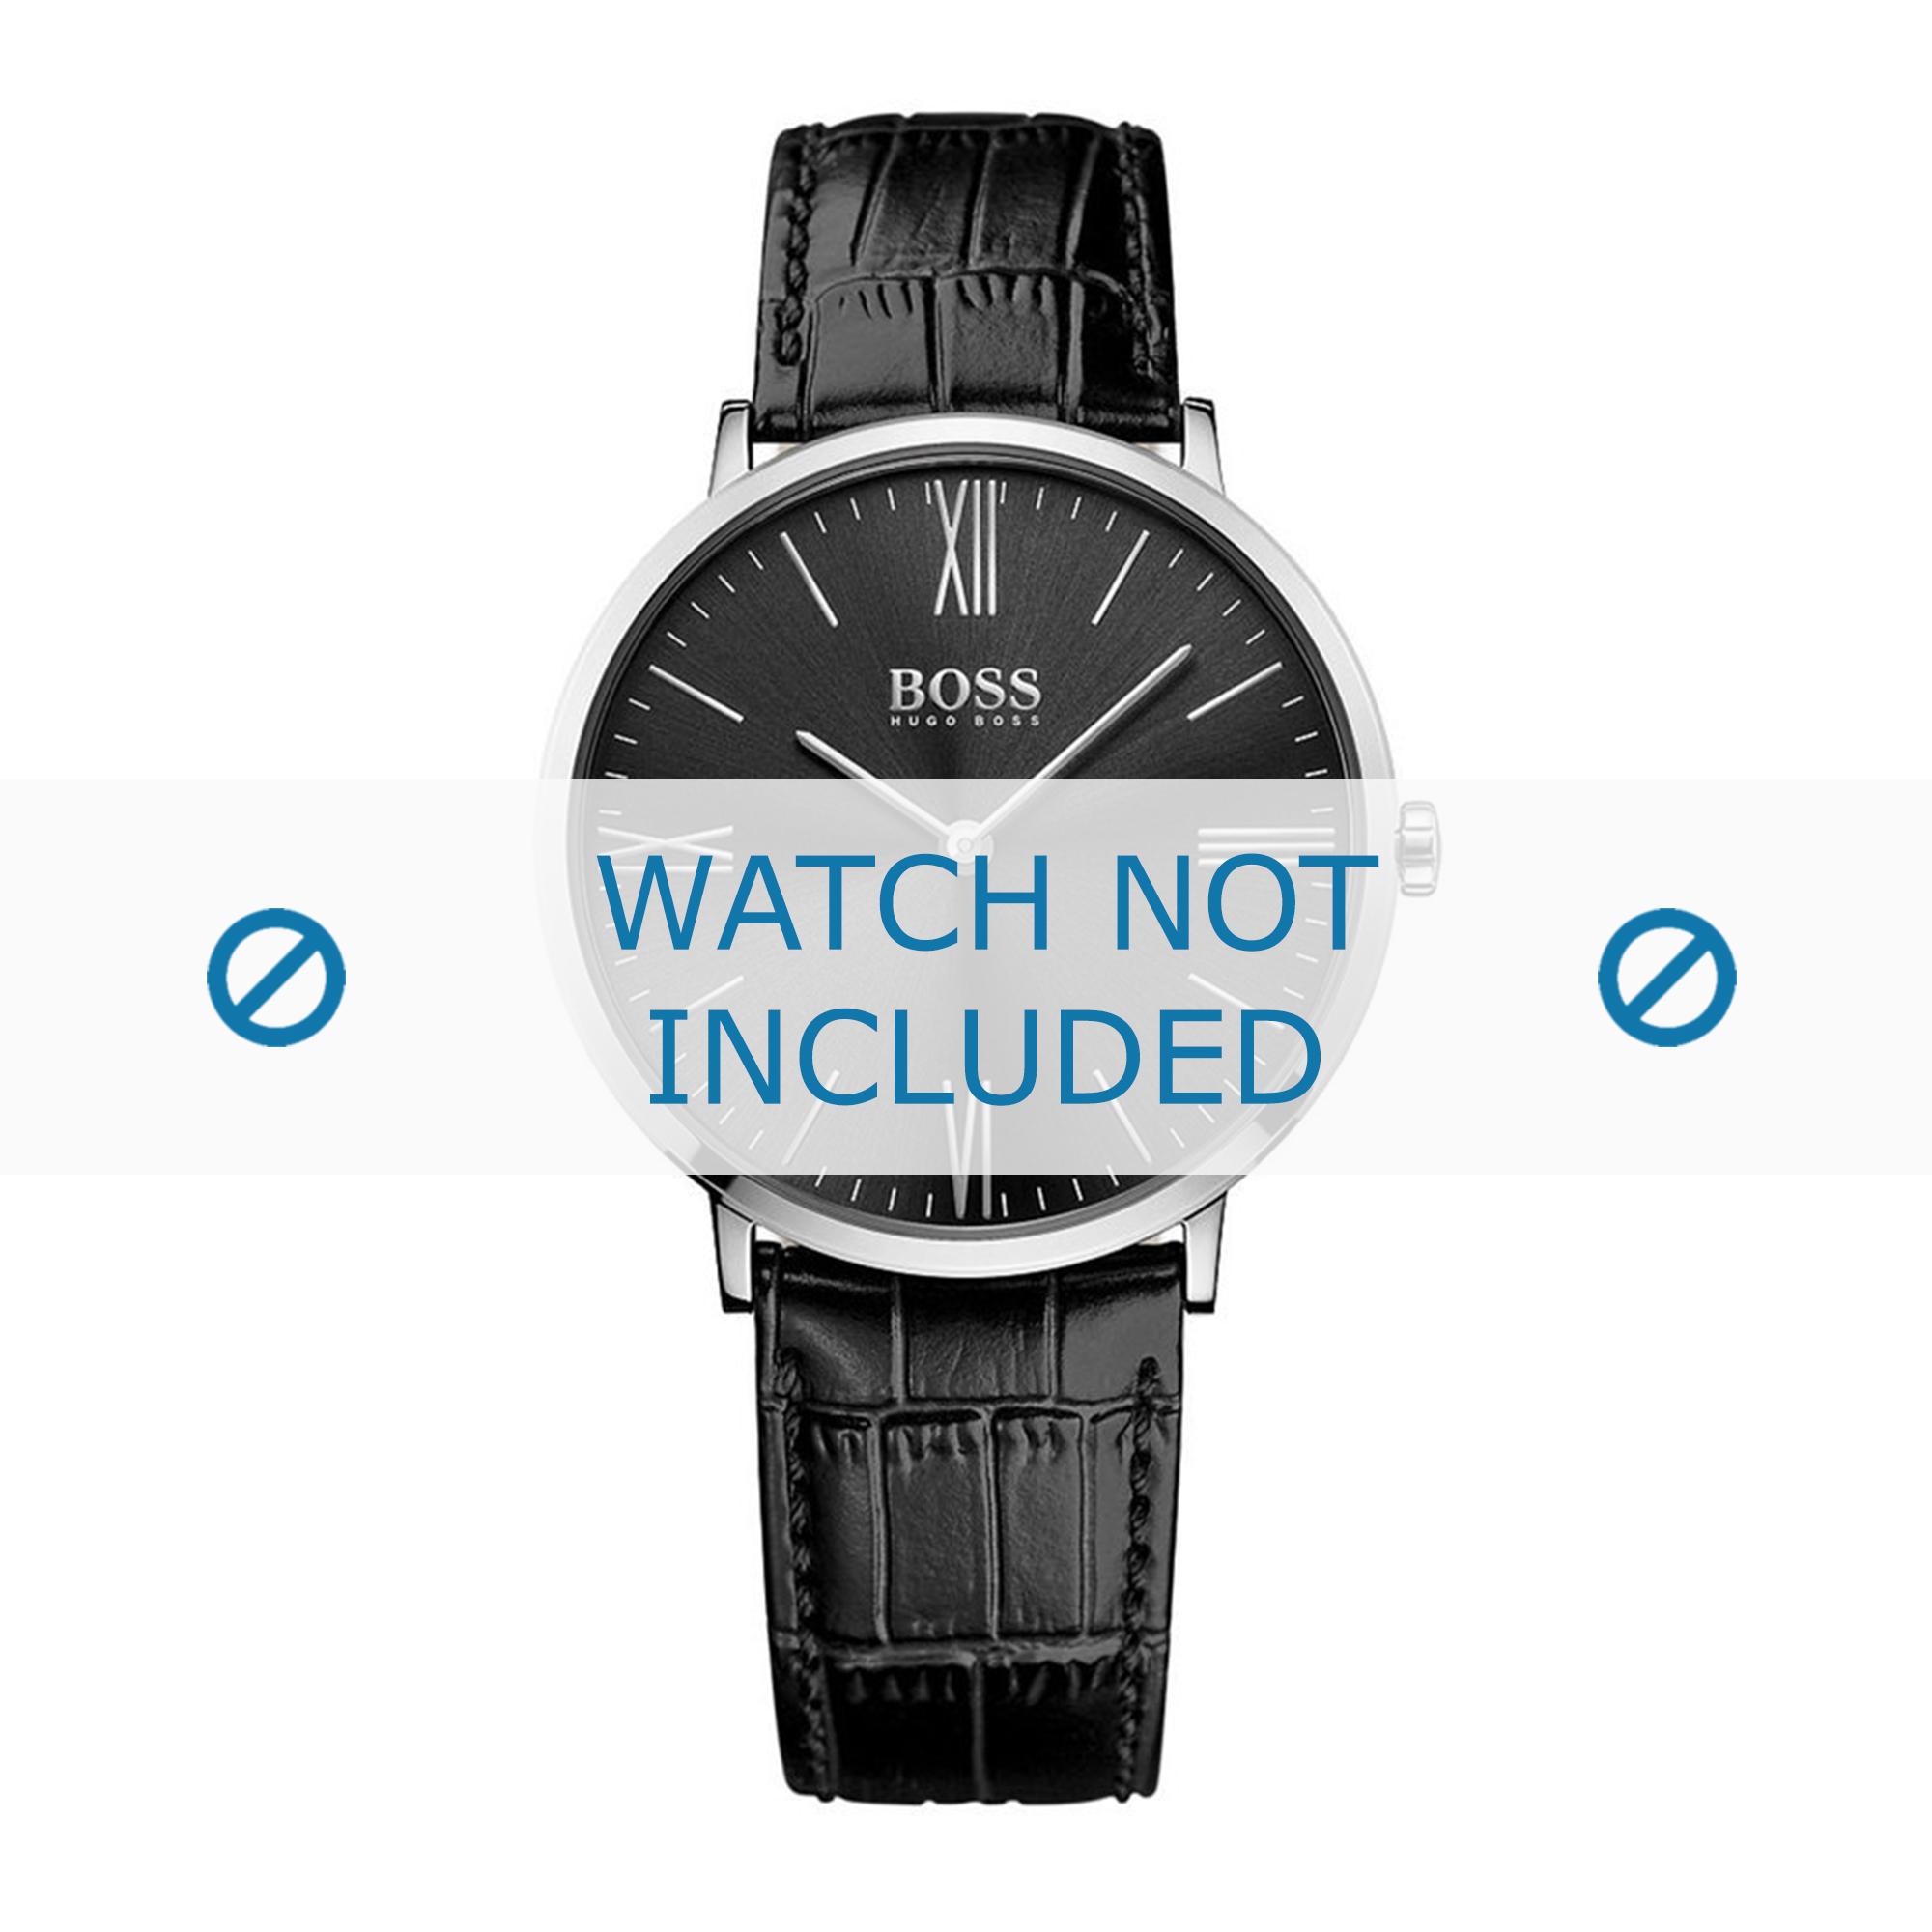 Hugo Boss horlogeband HB-286-1-14-2893-HB1513369 Croco leder Zwart + zwart stiksel